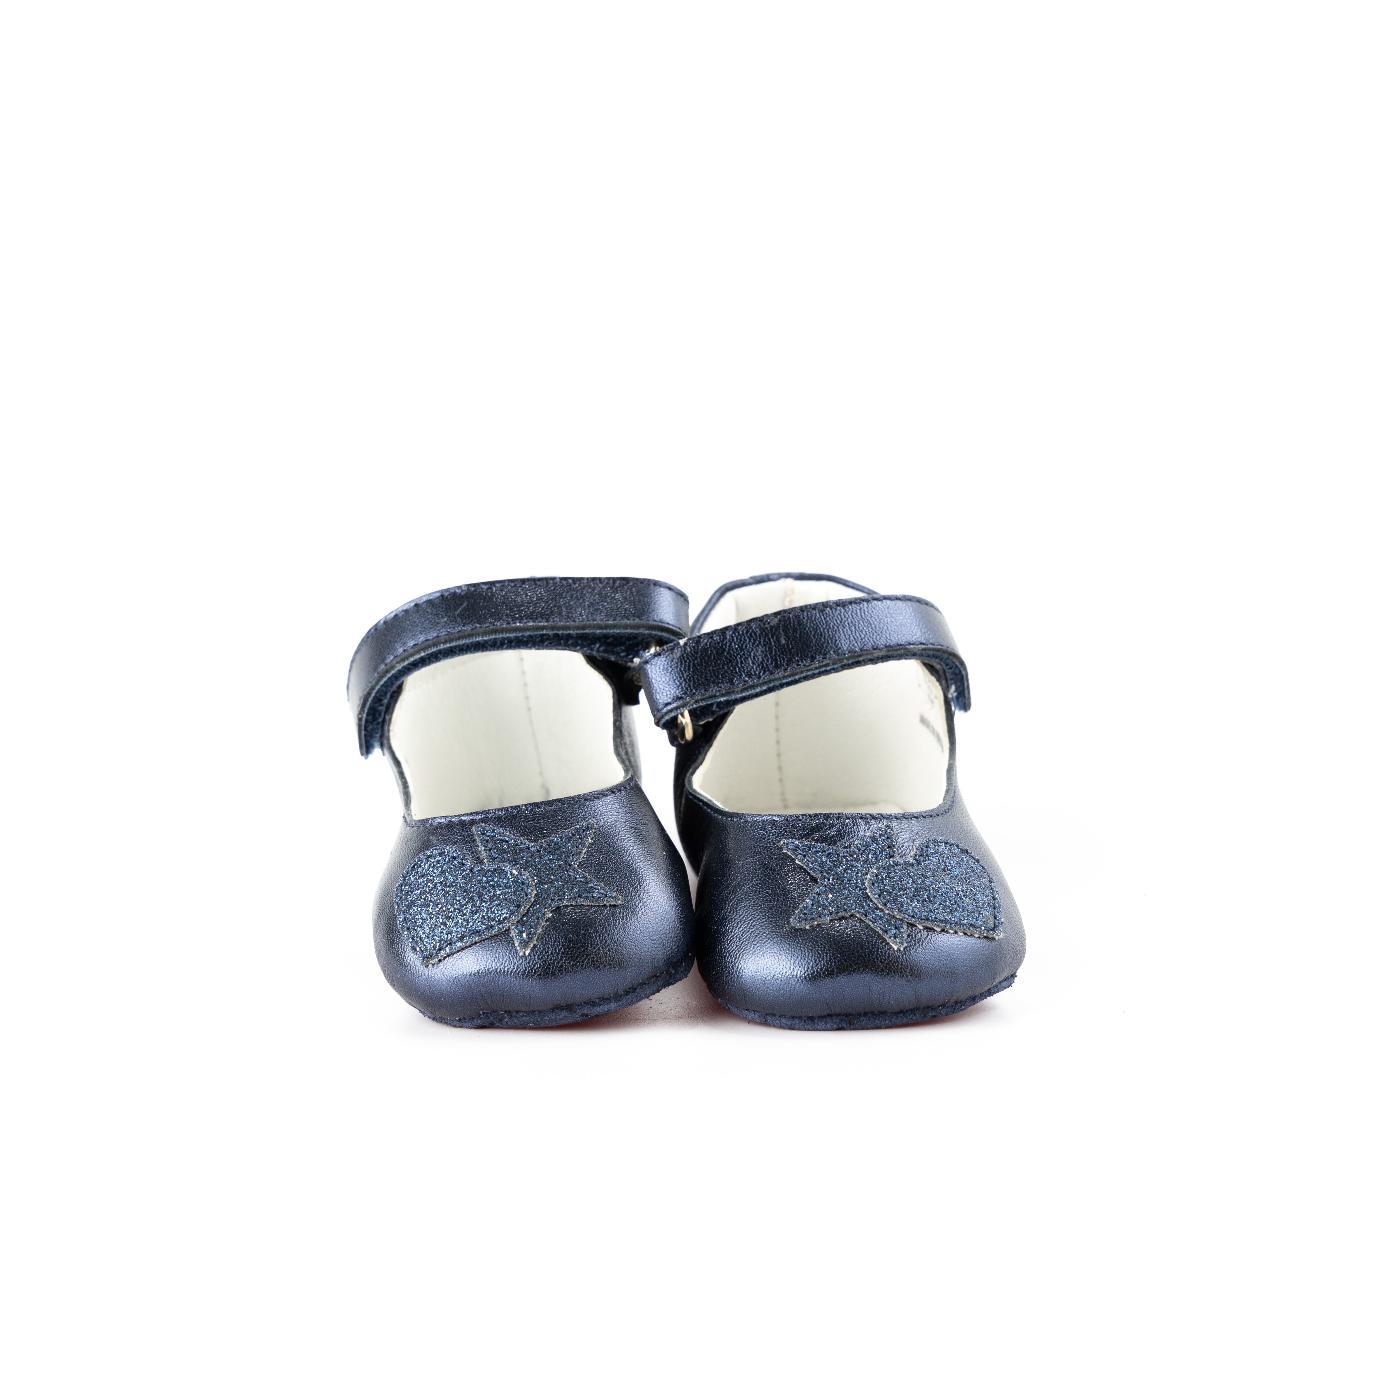 Midnight blue ballerina shoes